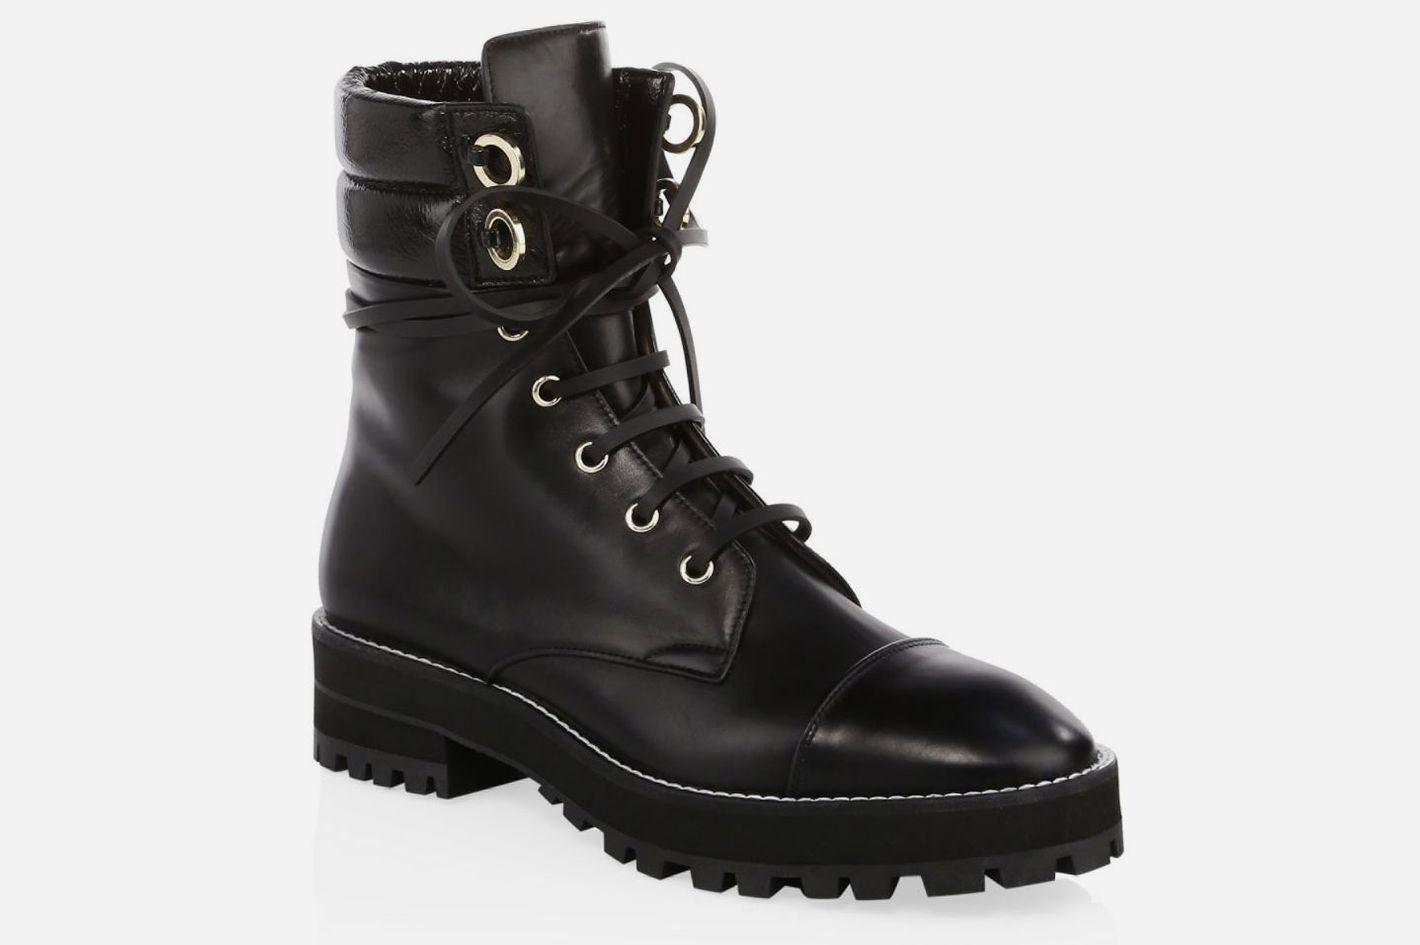 804386e5d8d The Best Combat Boots for Women